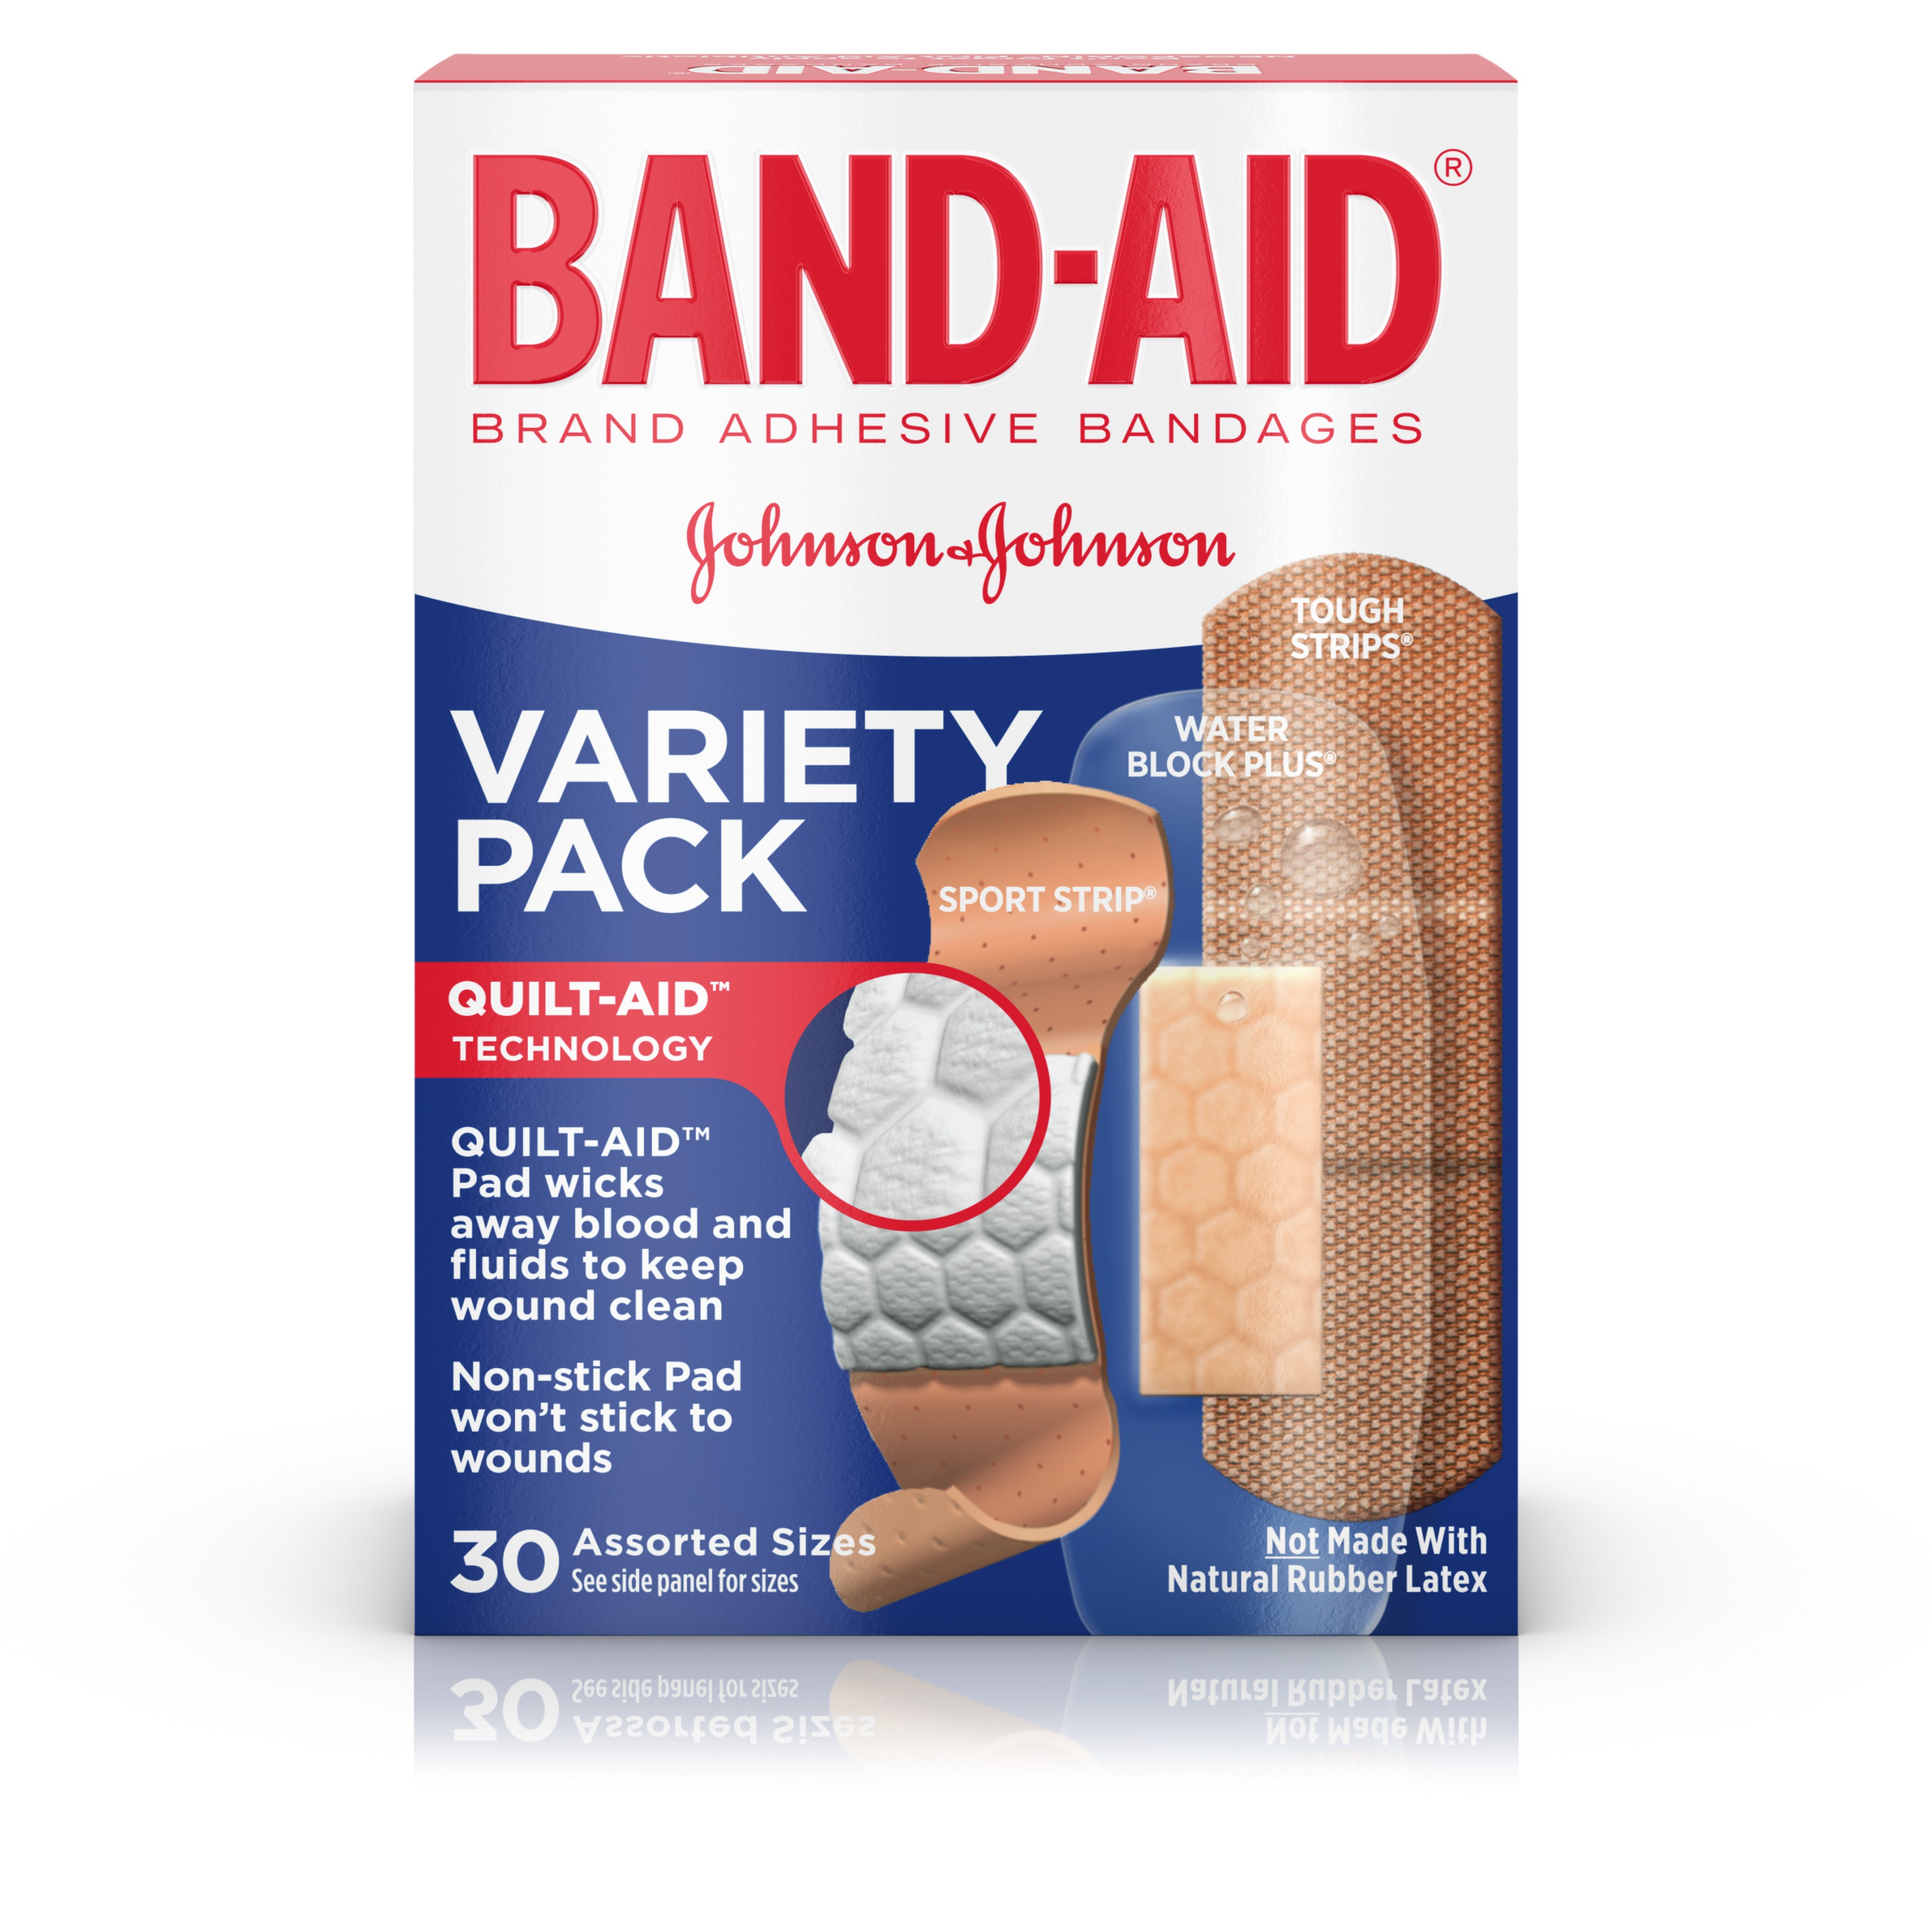 Band-Aid Brand Active Lifestyles Adhesive Bandage Variety Pack, 30 ct